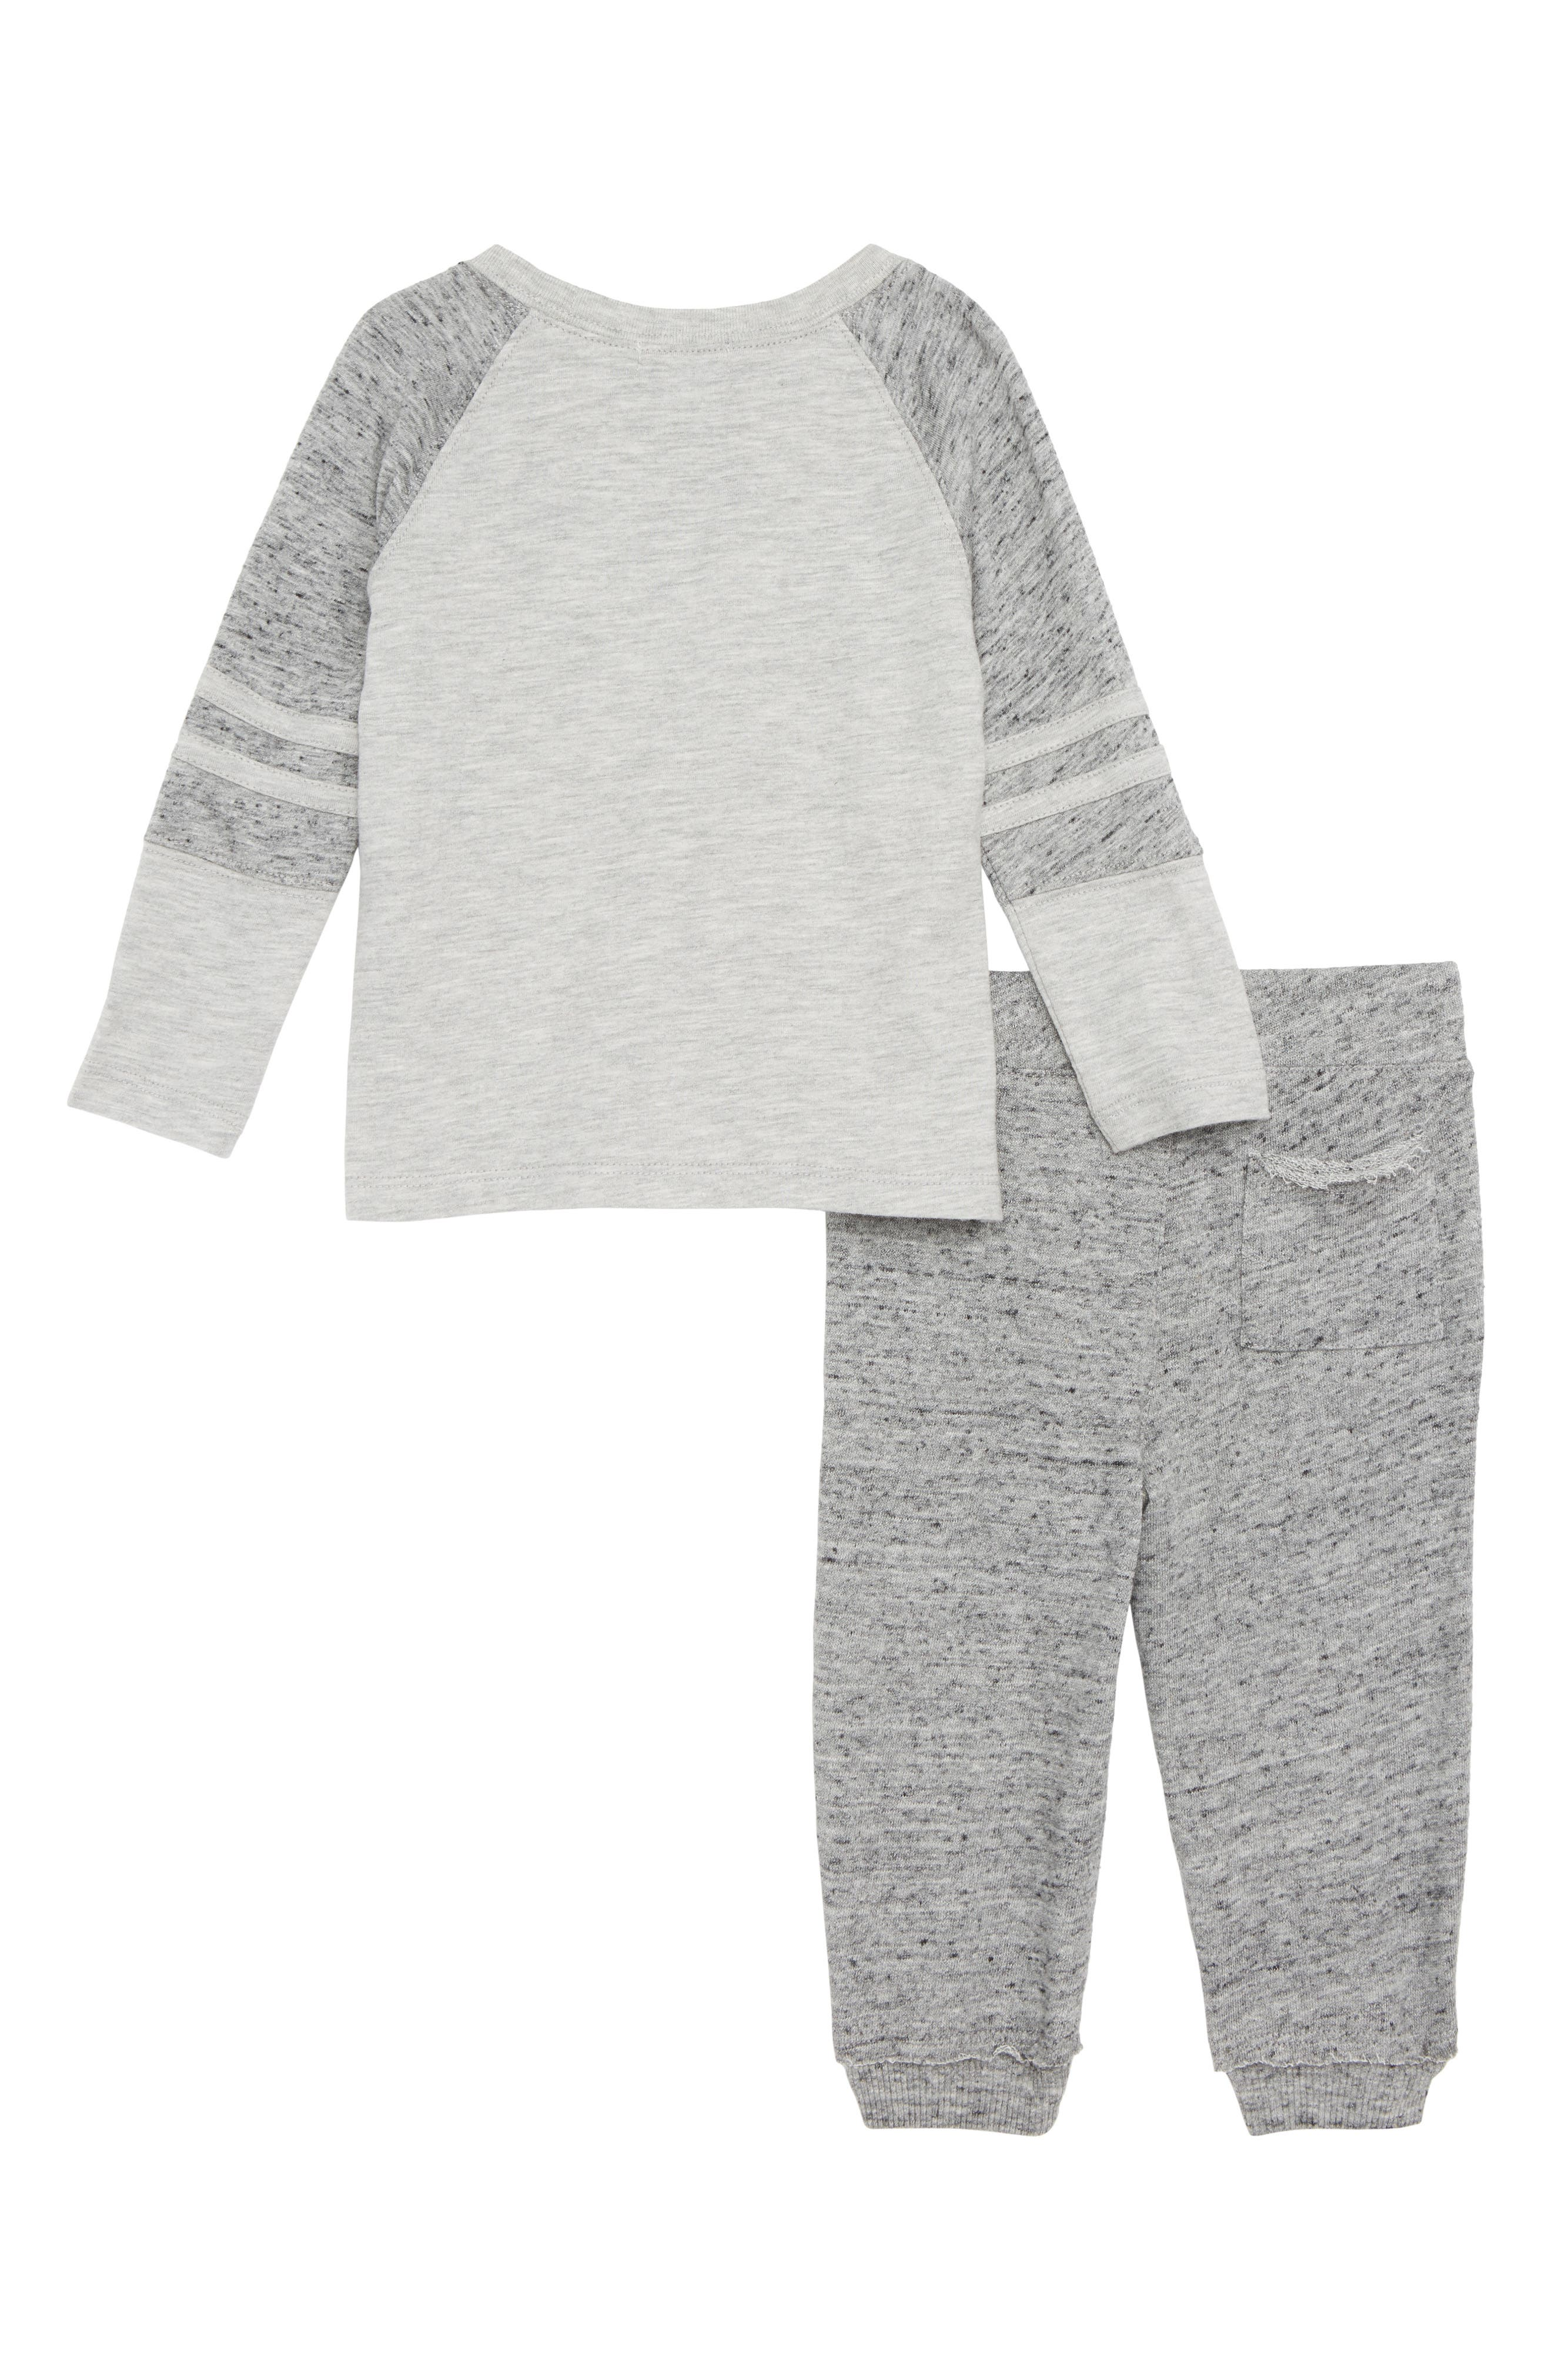 Raglan T-Shirt & Sweatpants Set,                             Alternate thumbnail 2, color,                             LIGHT GREY HEATHER 051